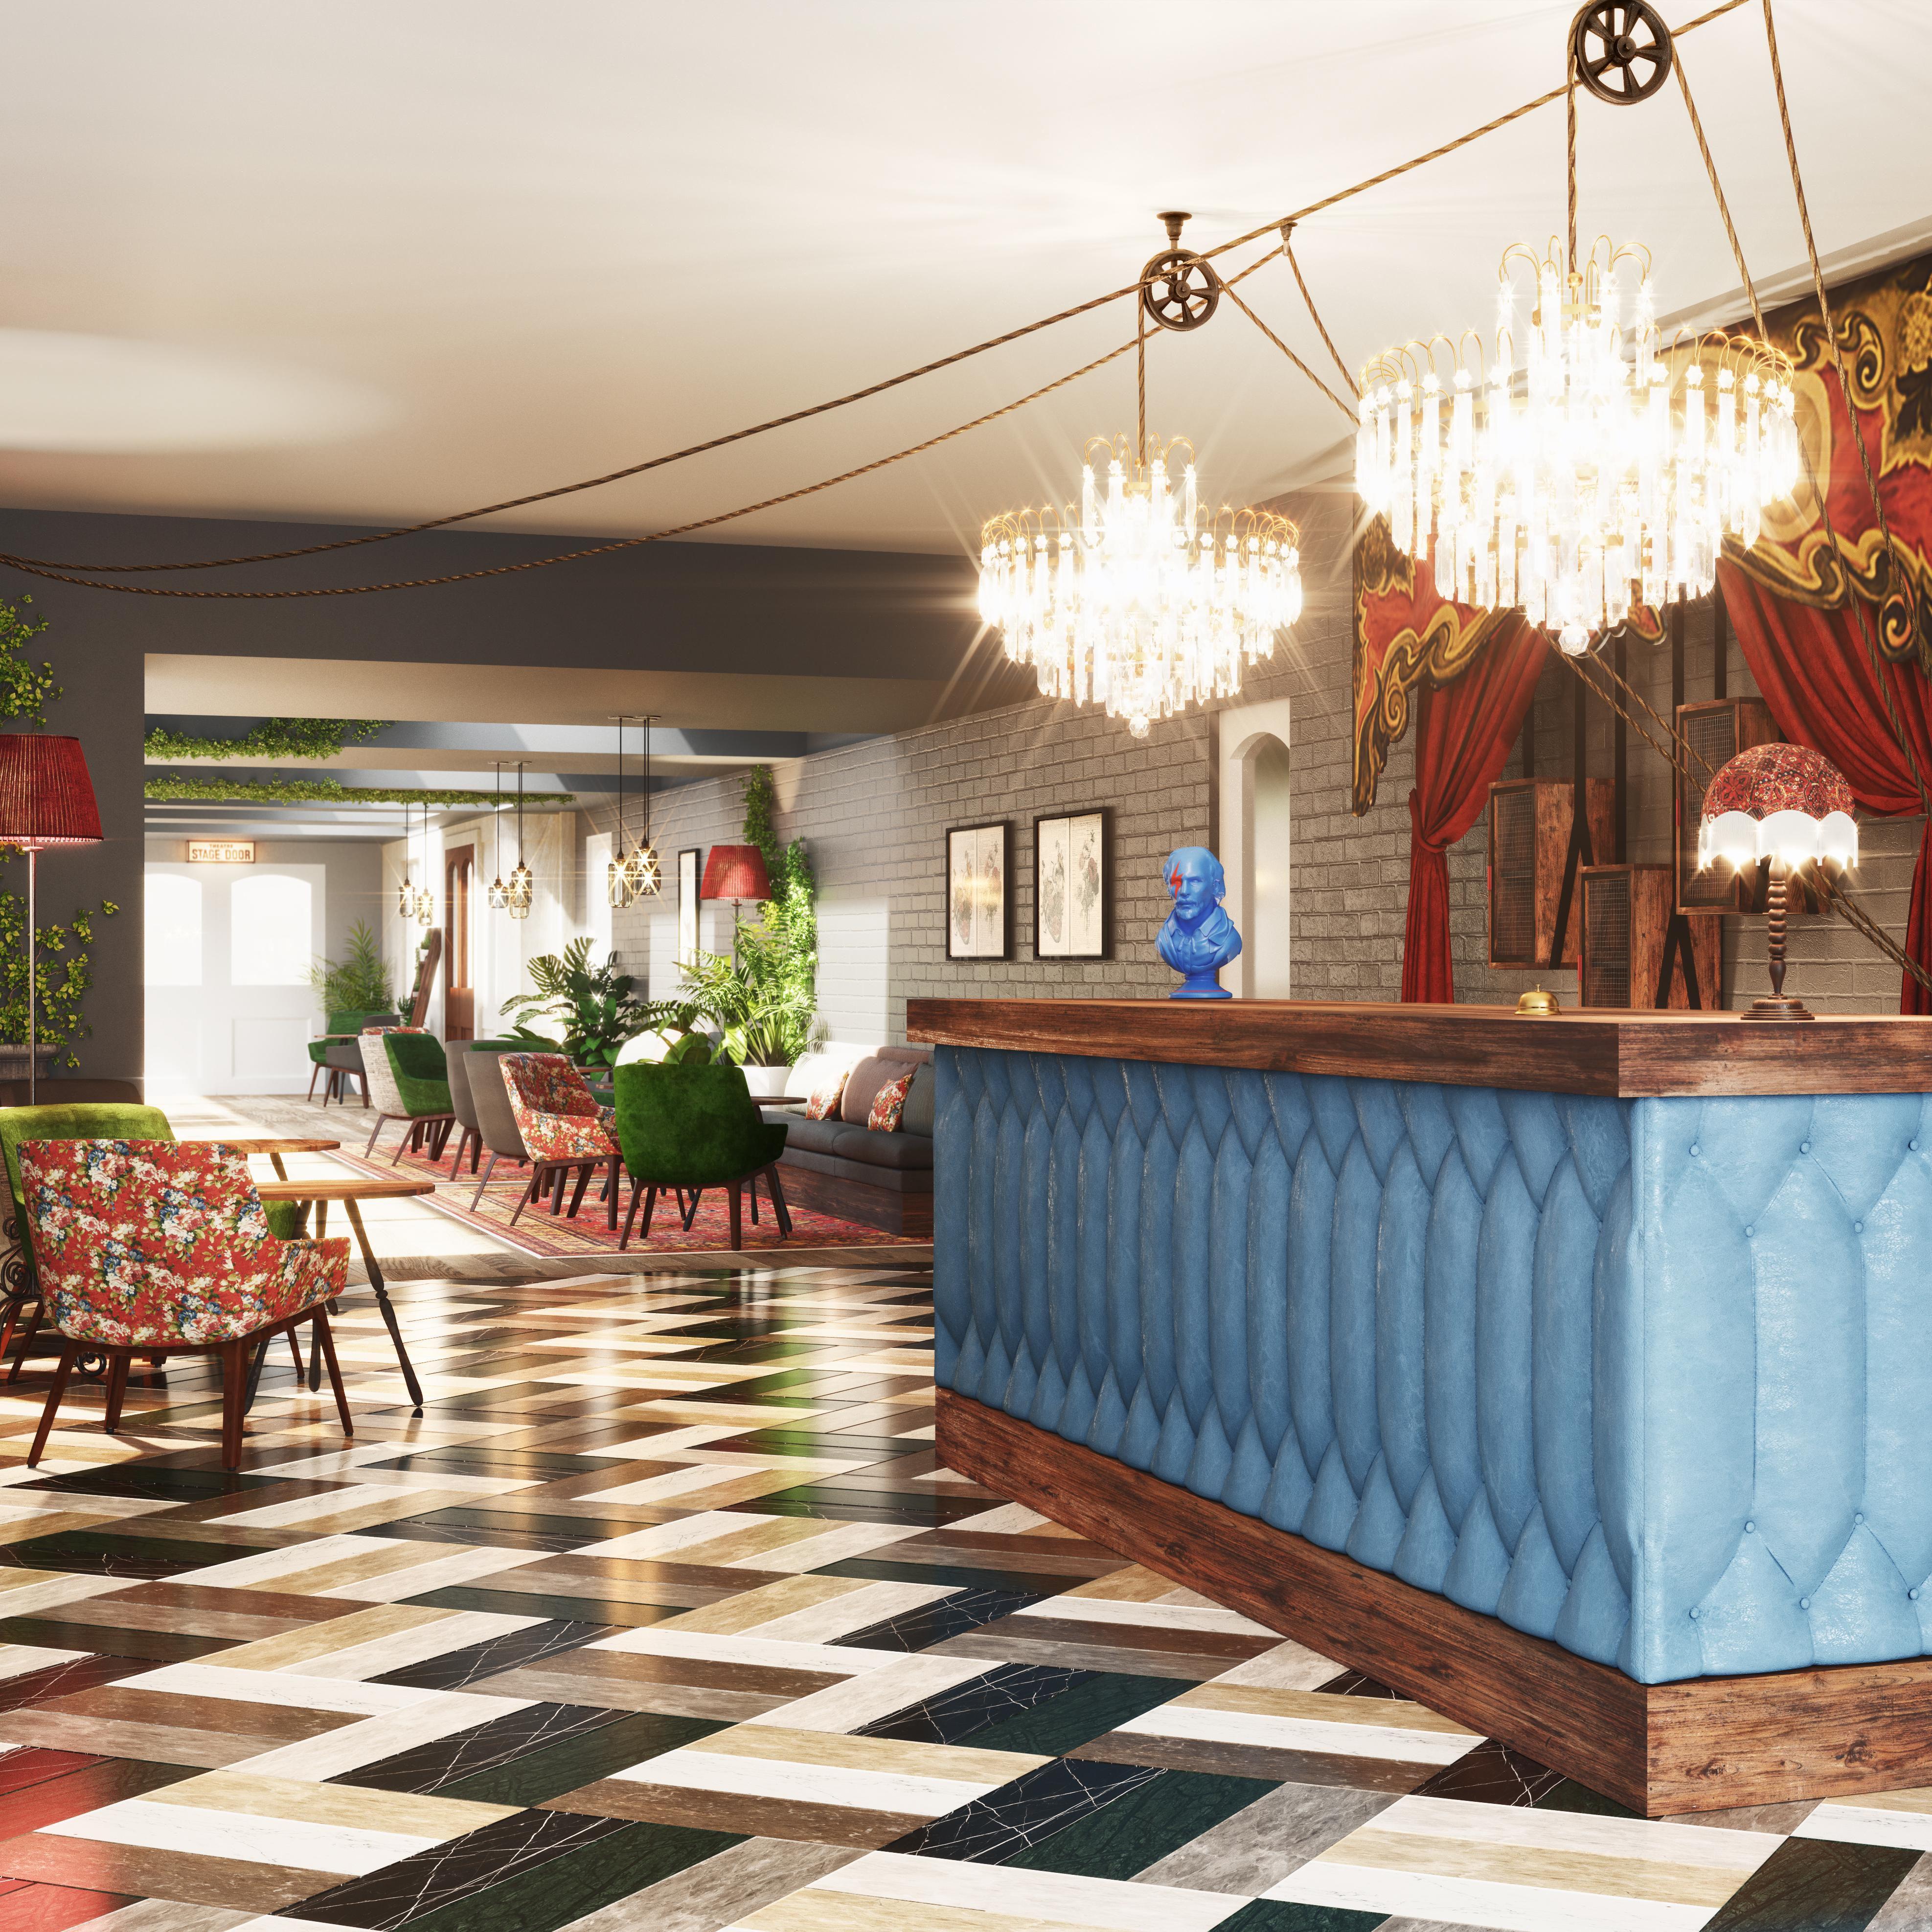 Hotel Indigo Stratford Upon Avon In Leamington Spa United Kingdom